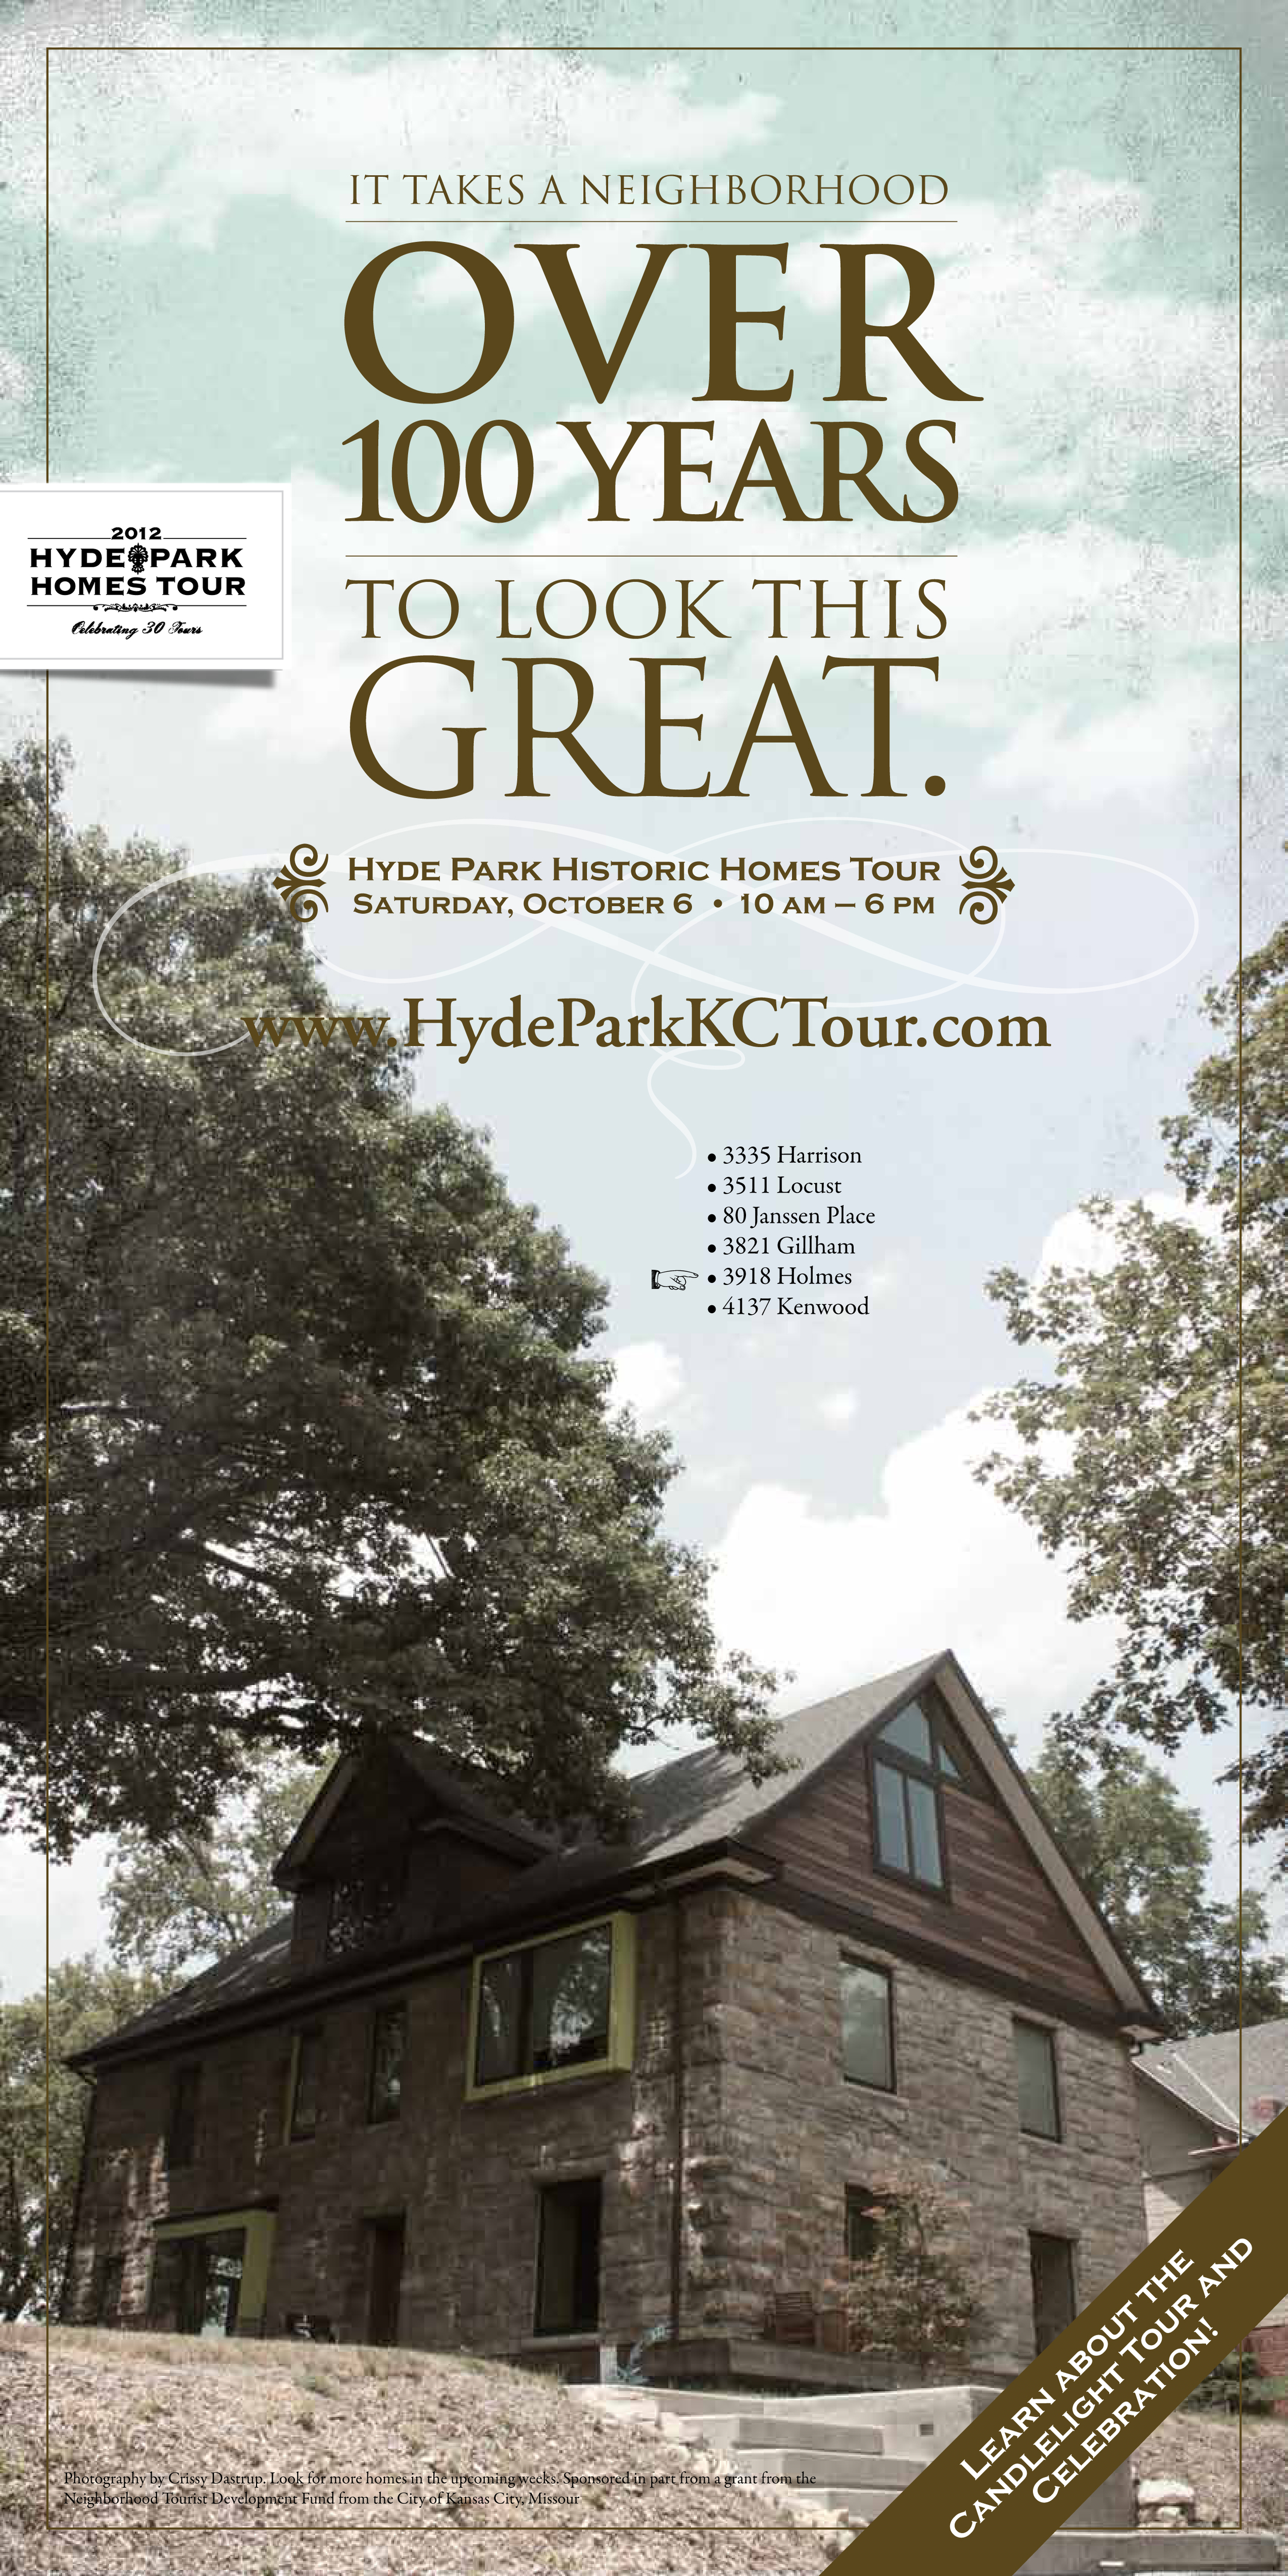 Homes Tour Flyer 5.jpg